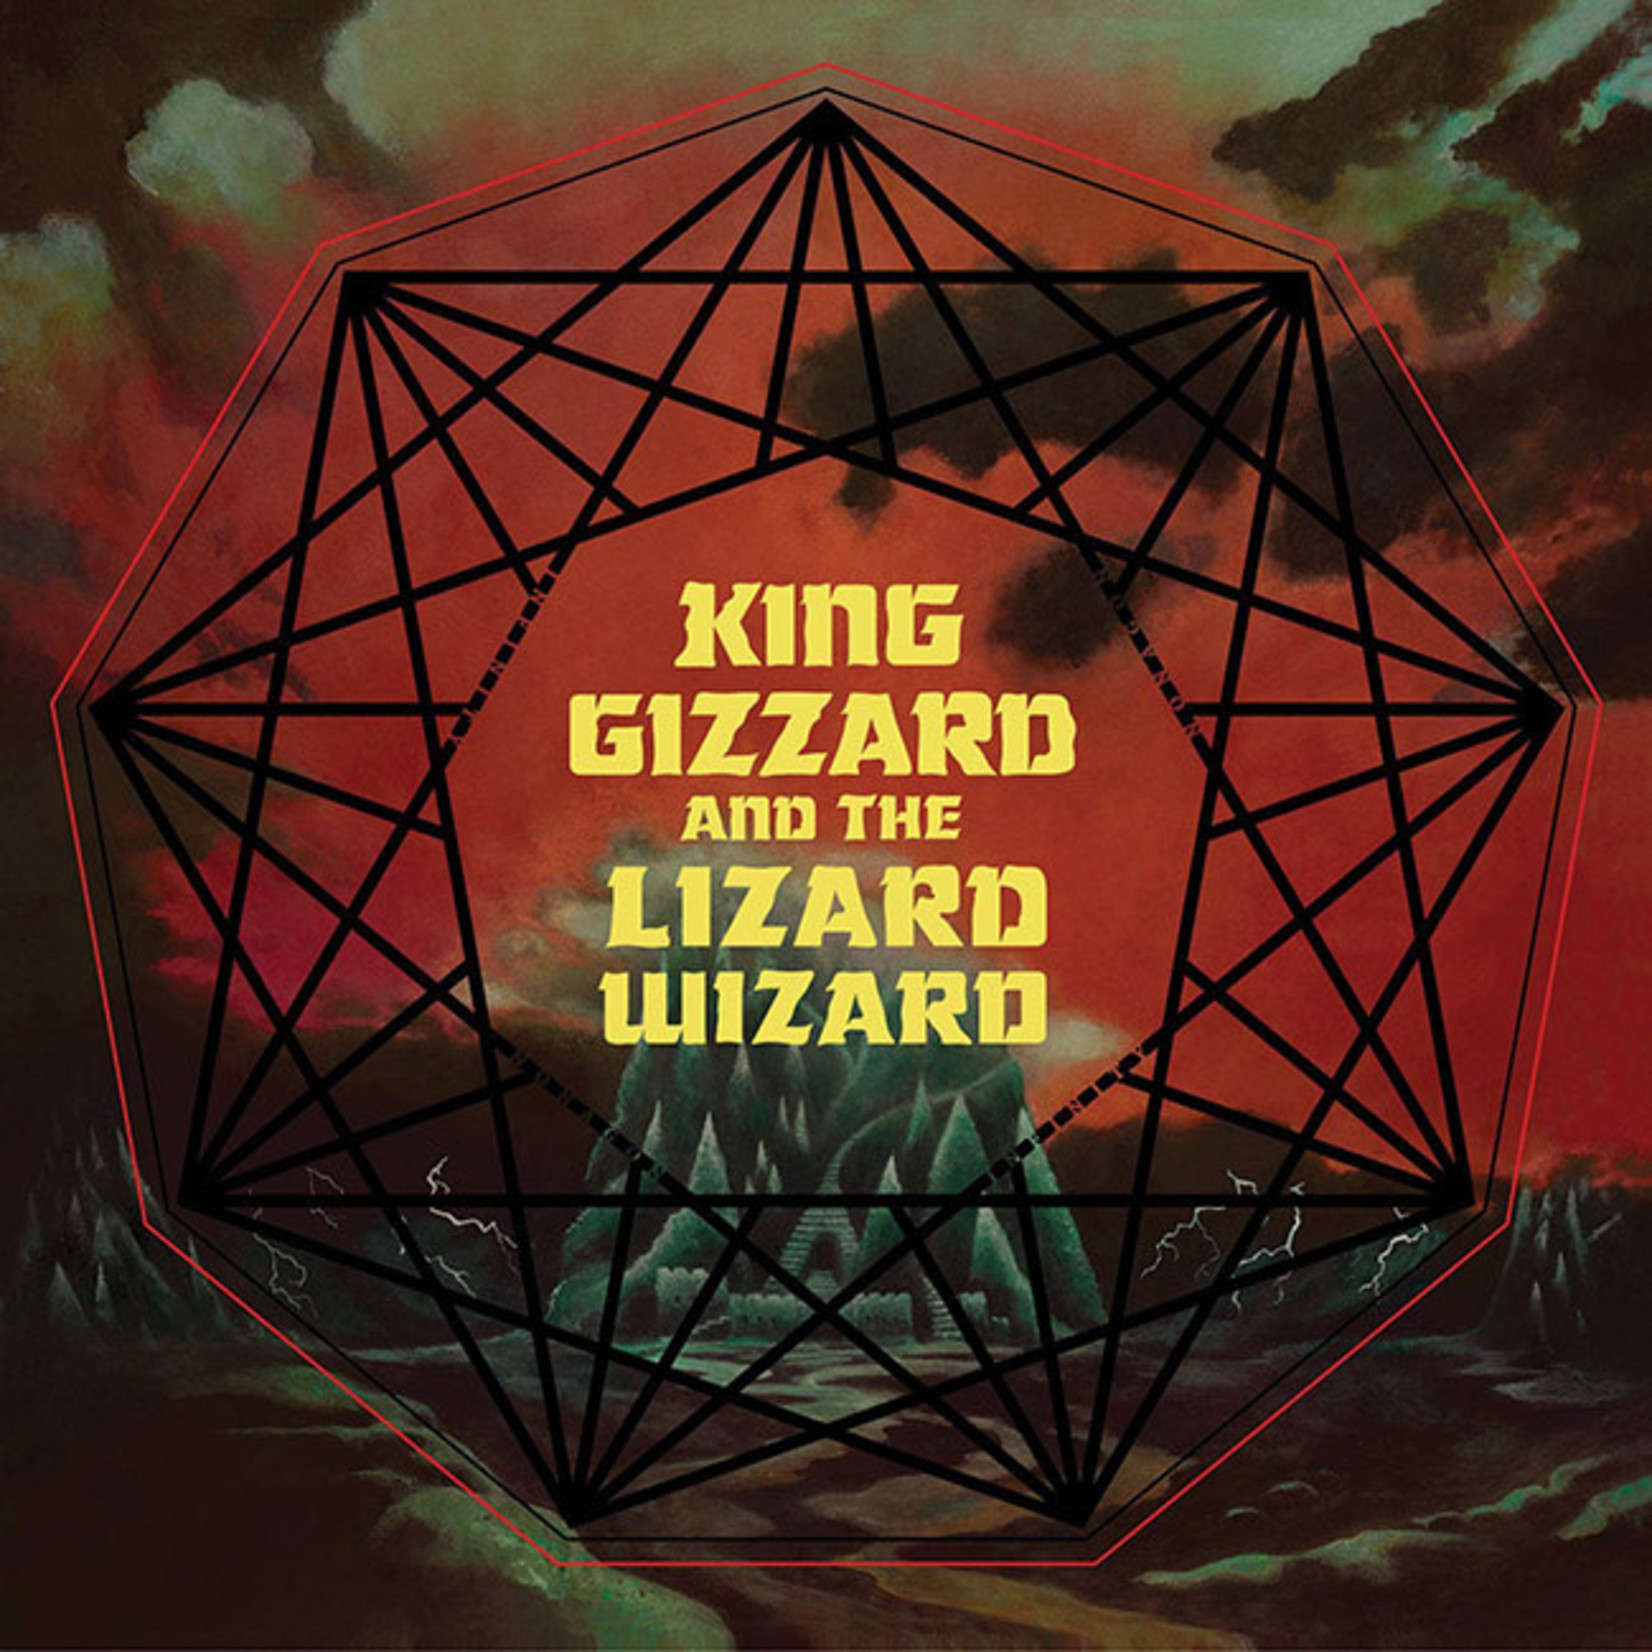 [New] King Gizzard & the Lizard Wizard: Nonagon Infinity